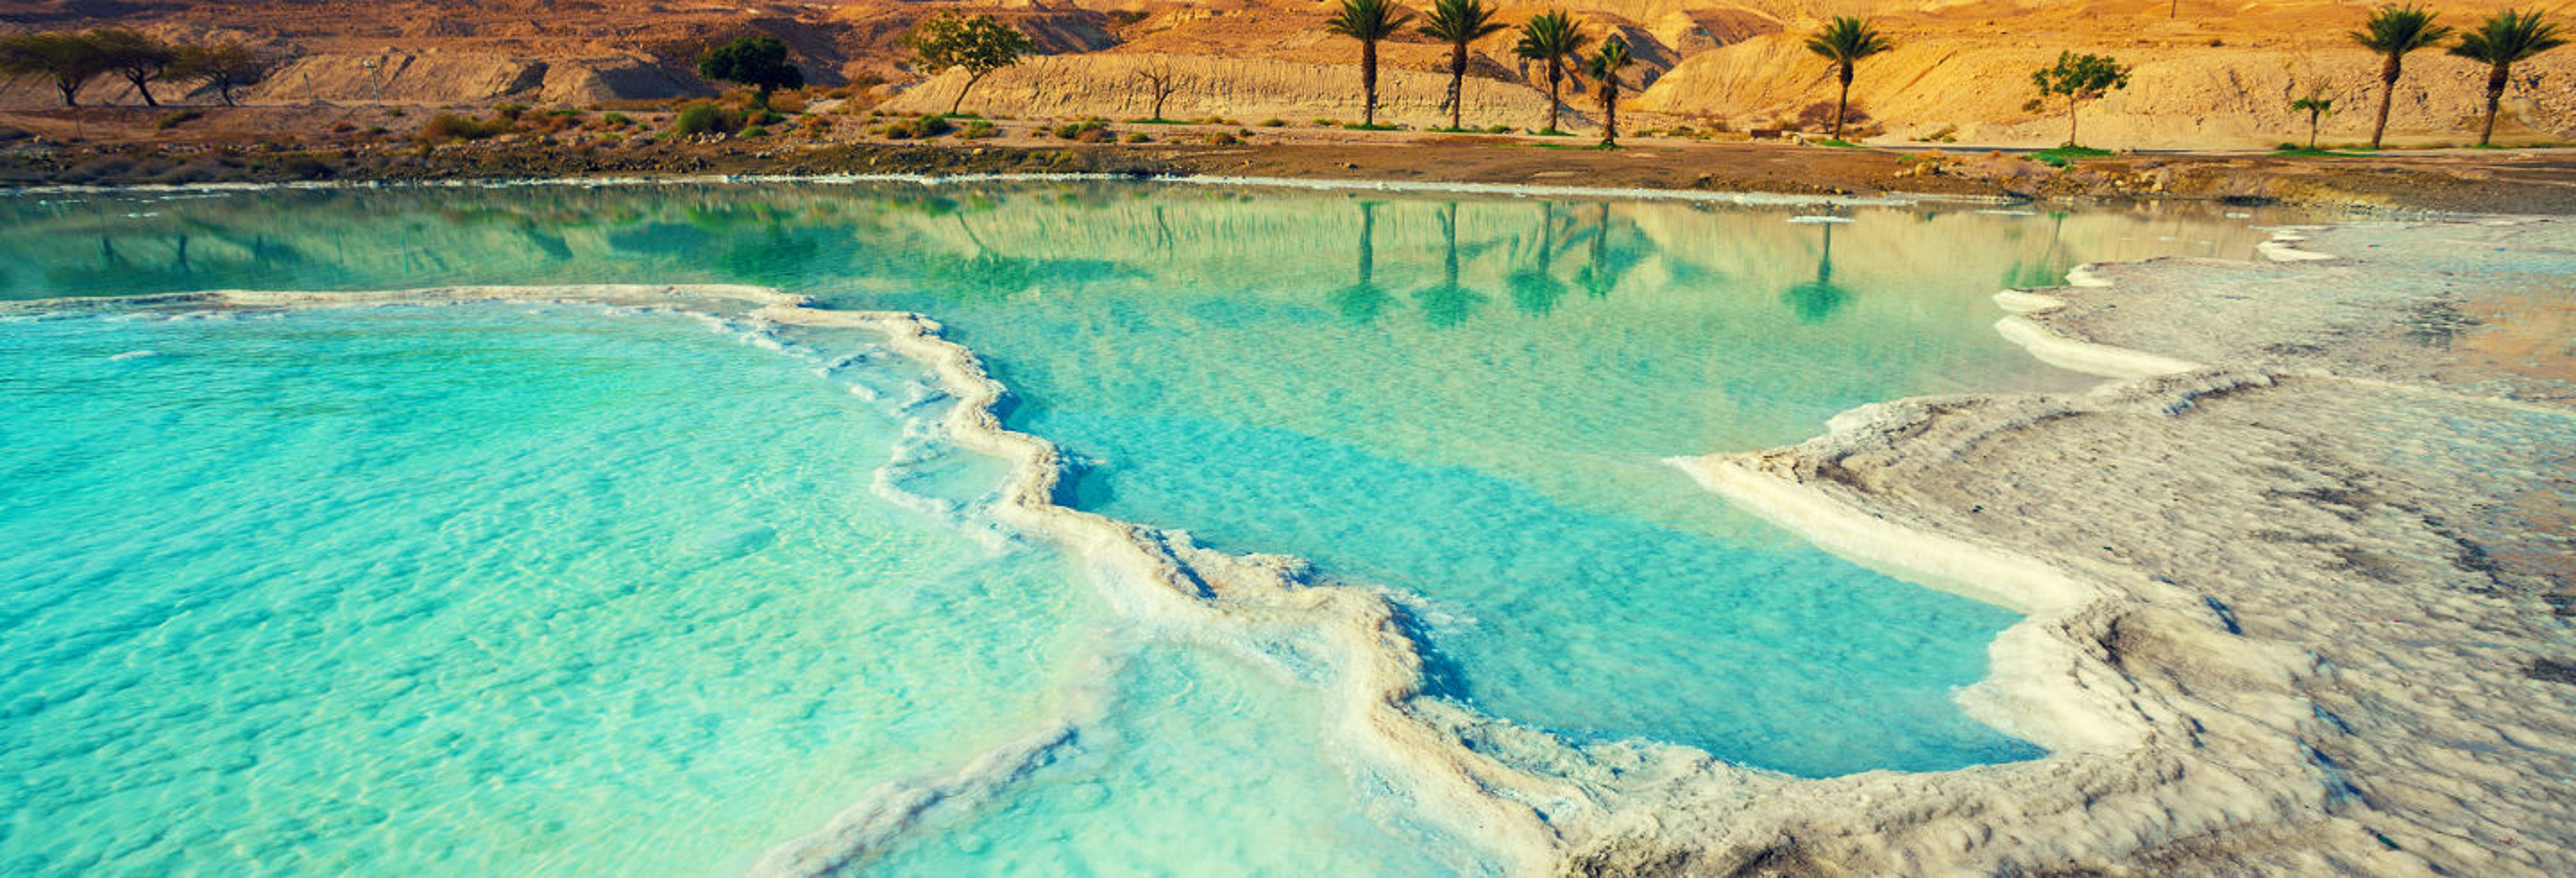 Bethany & Dead Sea Tour